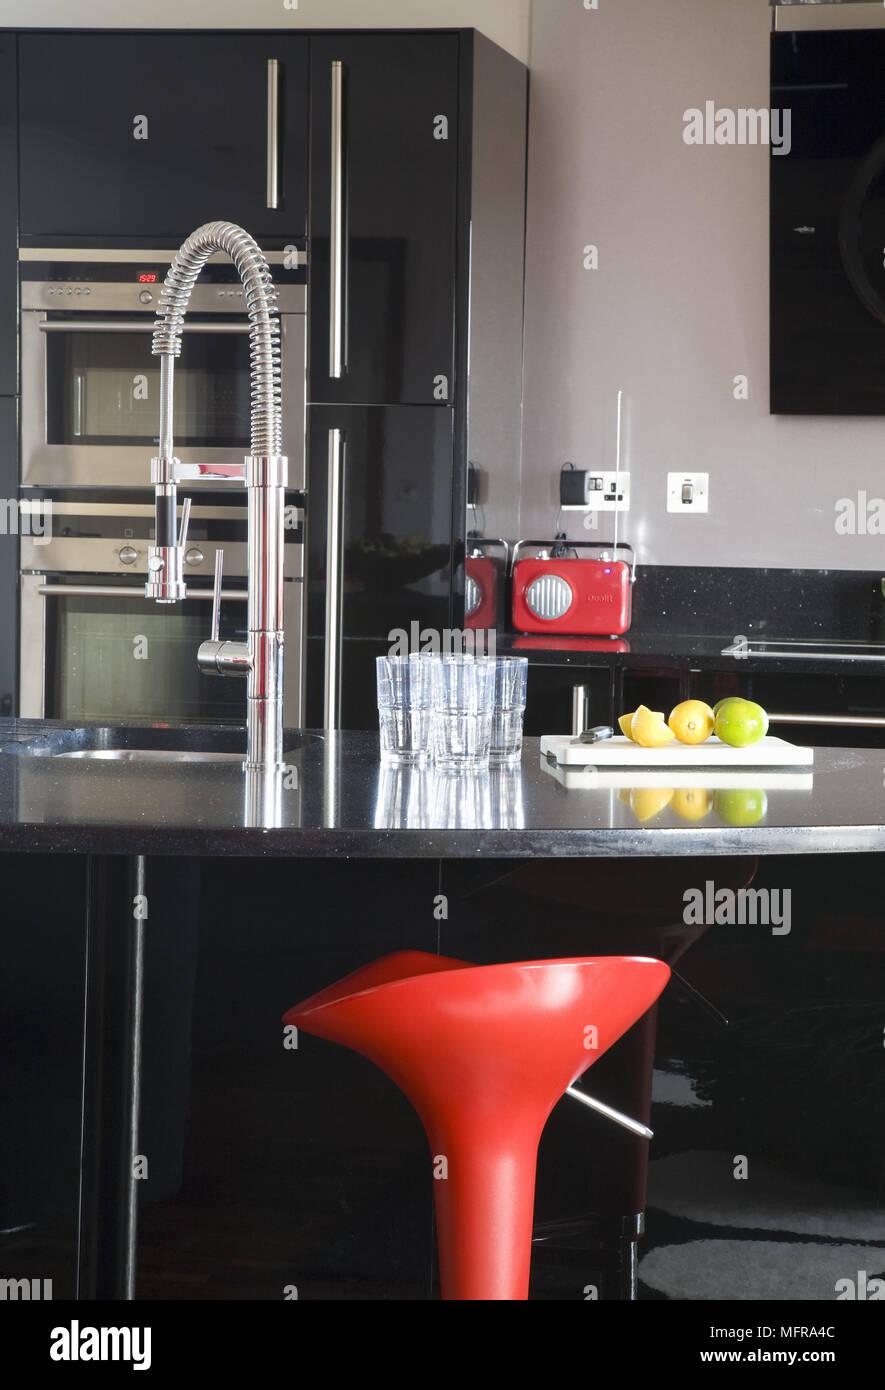 Sensational Red Bar Stool At Breakfast Bar In Contemporary Kitchen Stock Machost Co Dining Chair Design Ideas Machostcouk